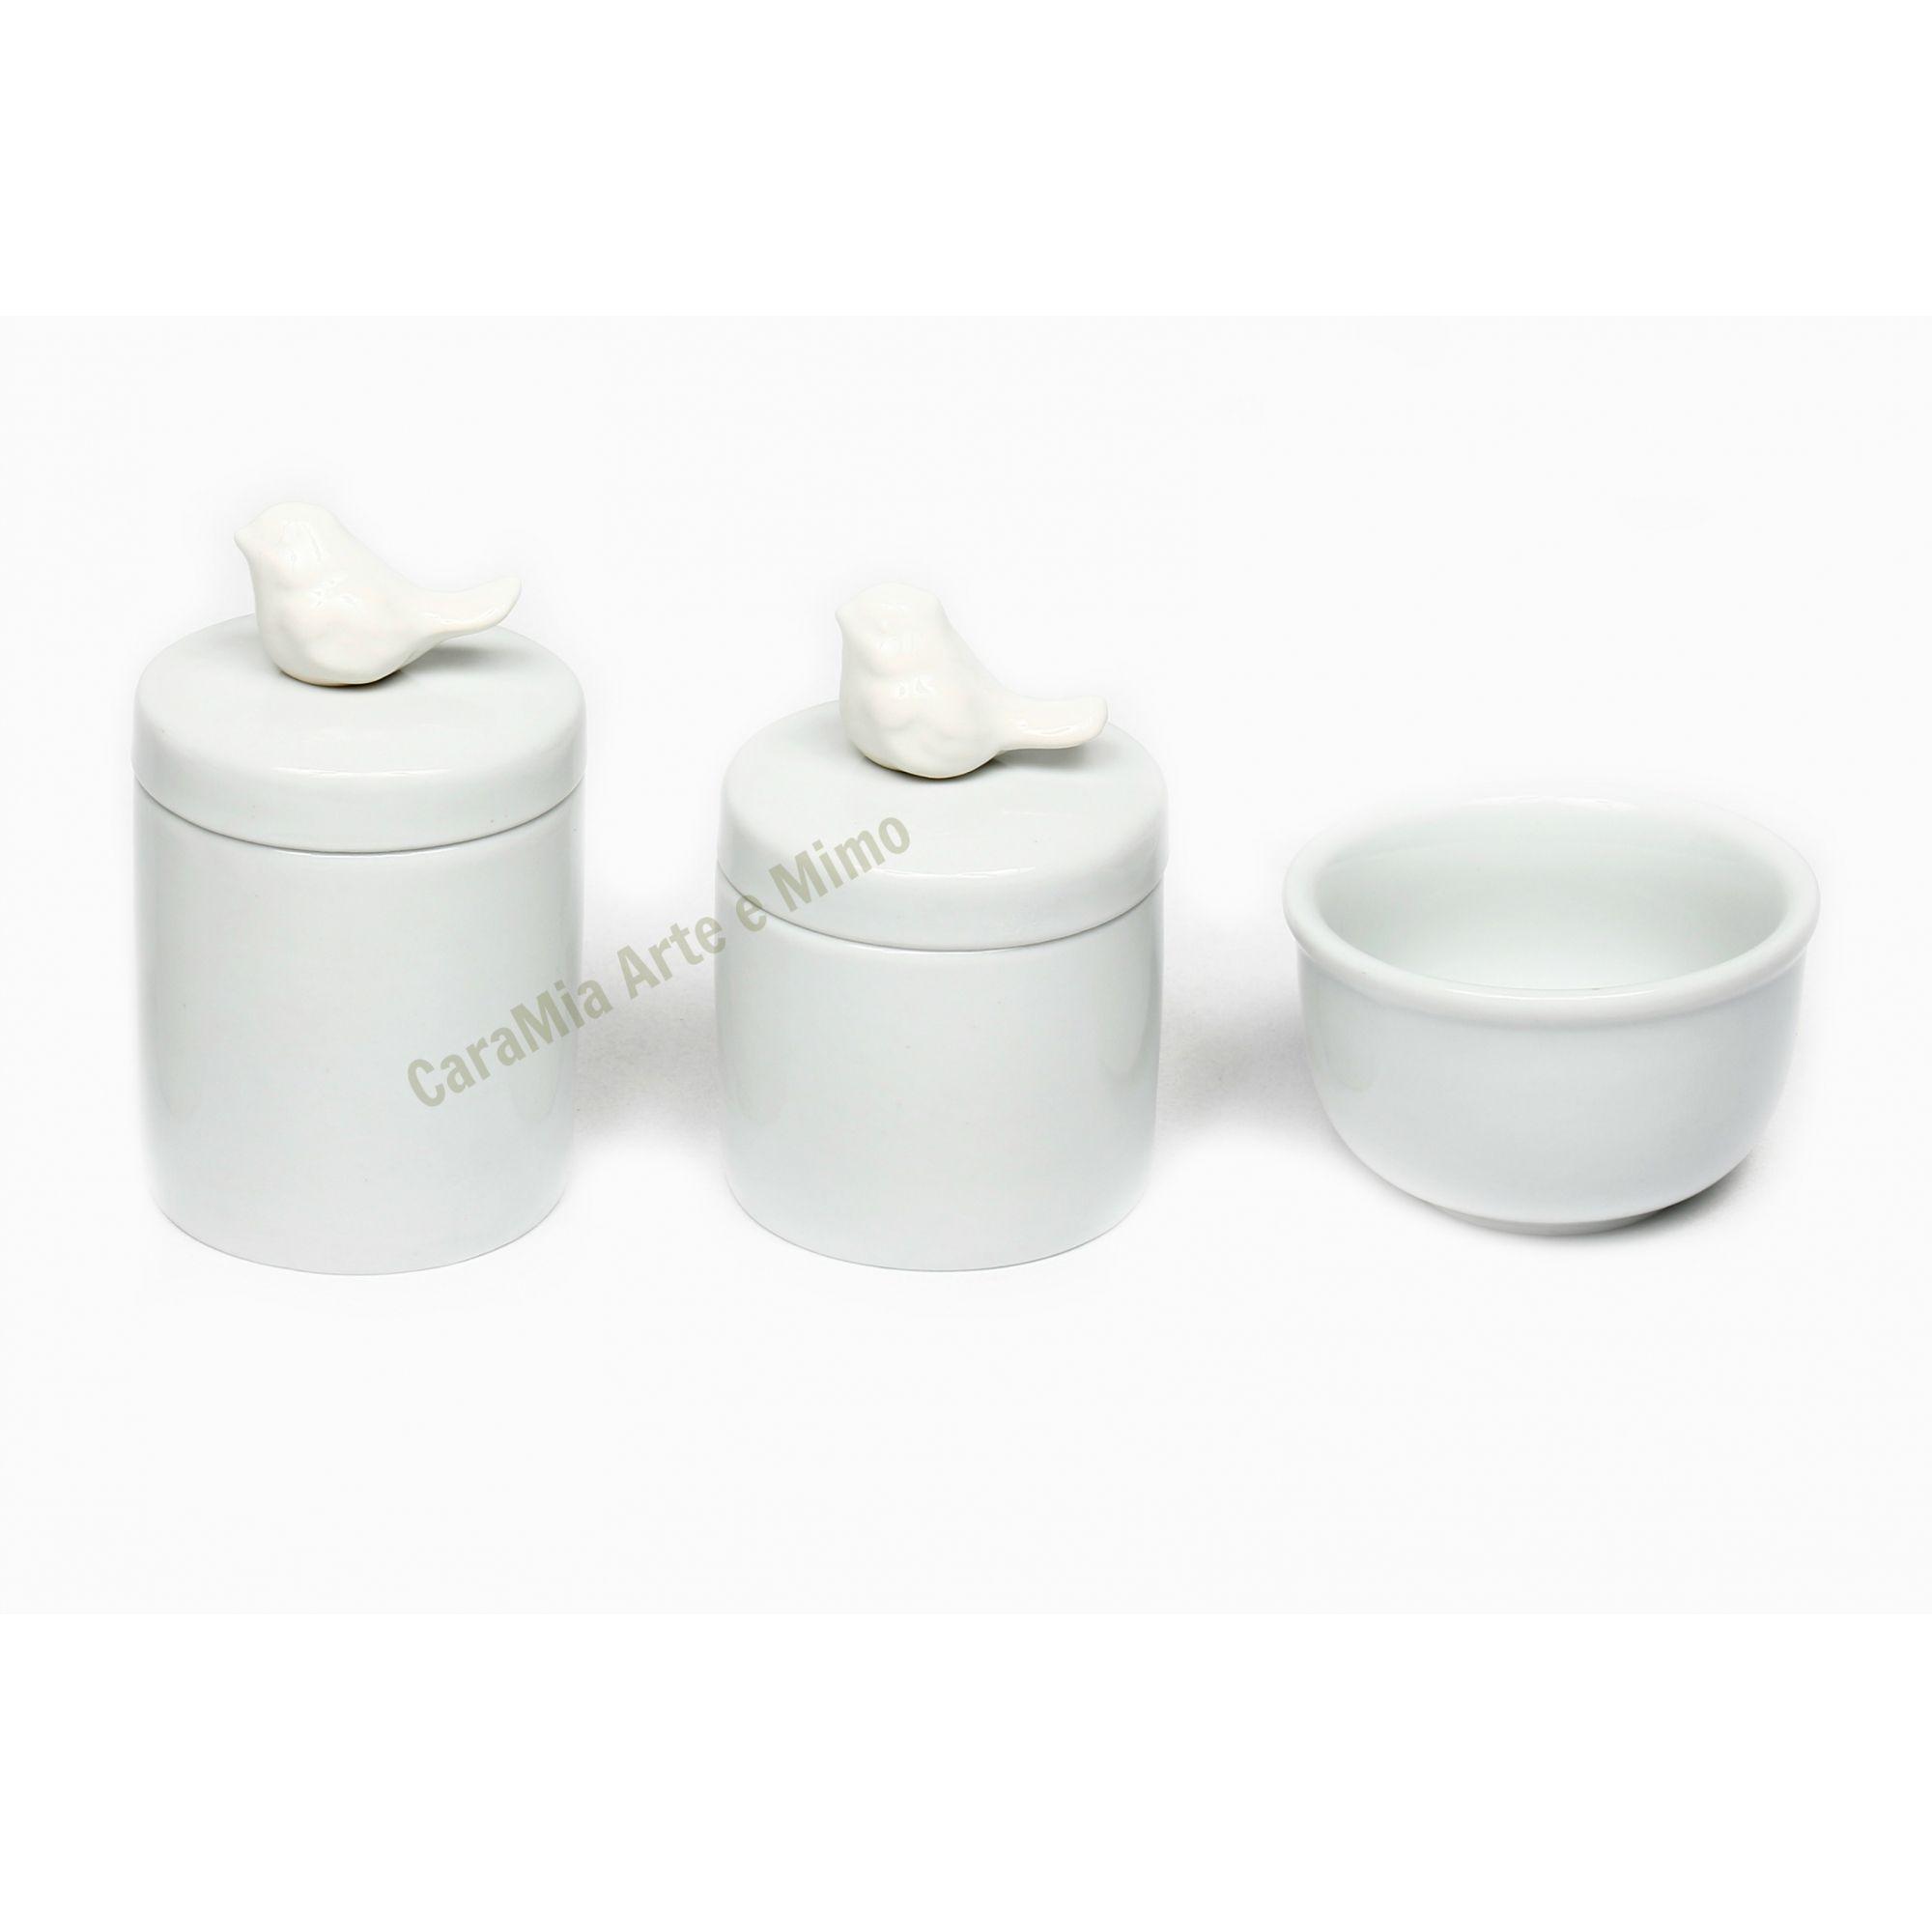 Kit Higiene Bebê Porcelana Branca Pássaros Brancos| 3 peças